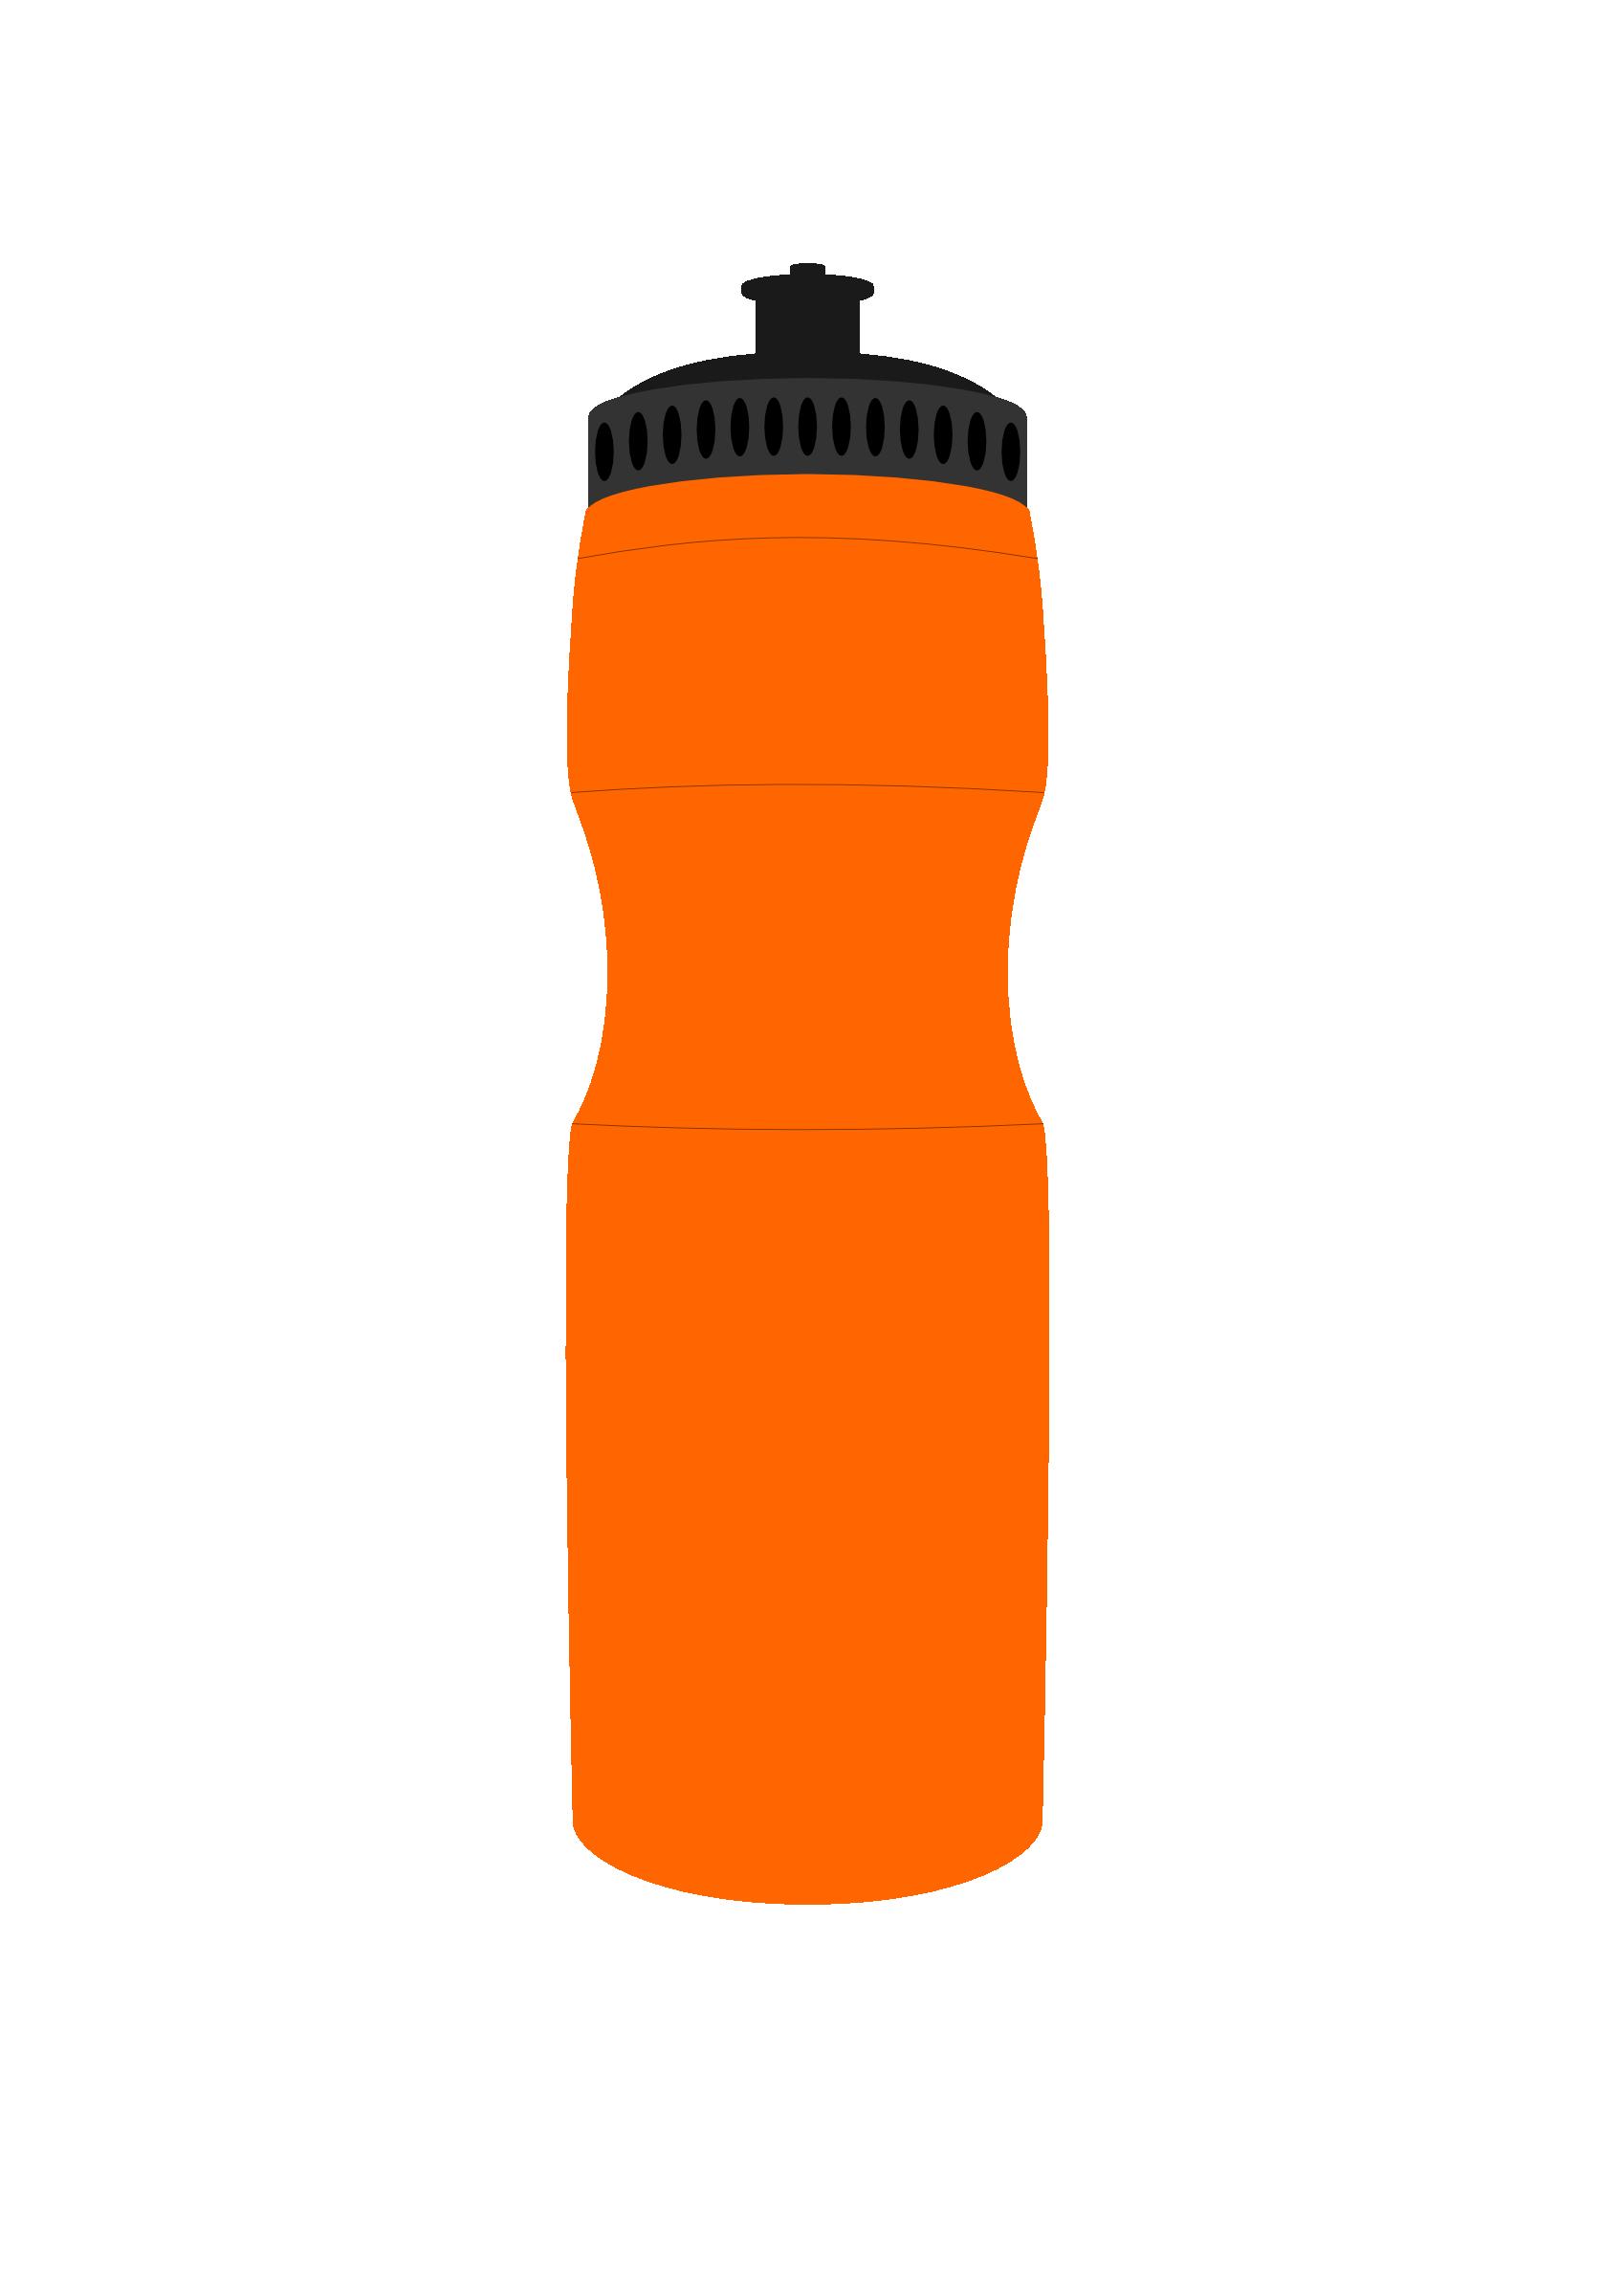 water bottle clipart-water bottle clipart-4